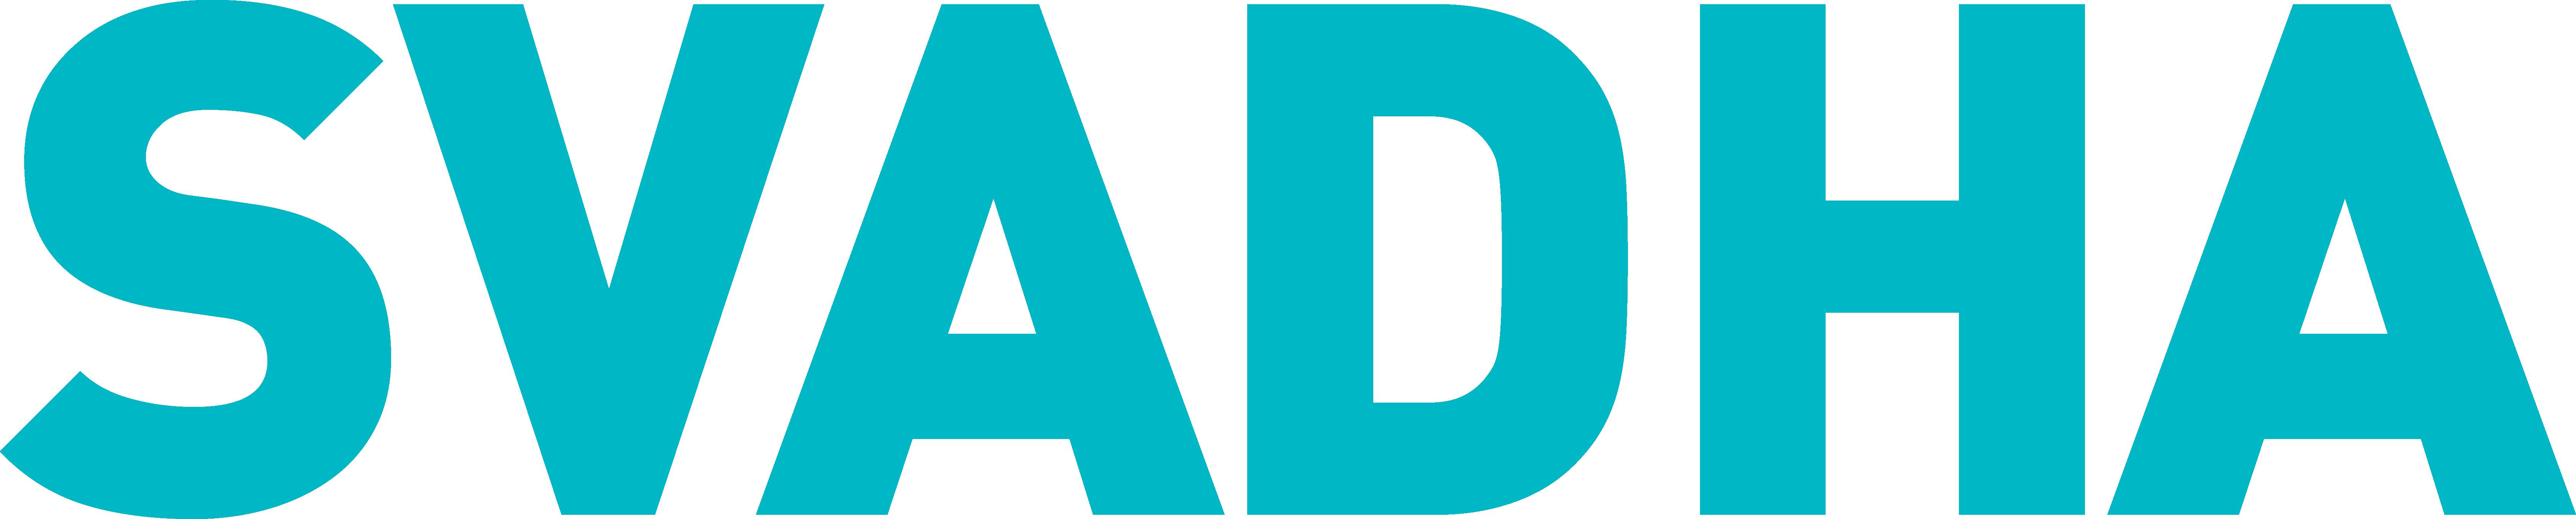 Svadha logo turquoise